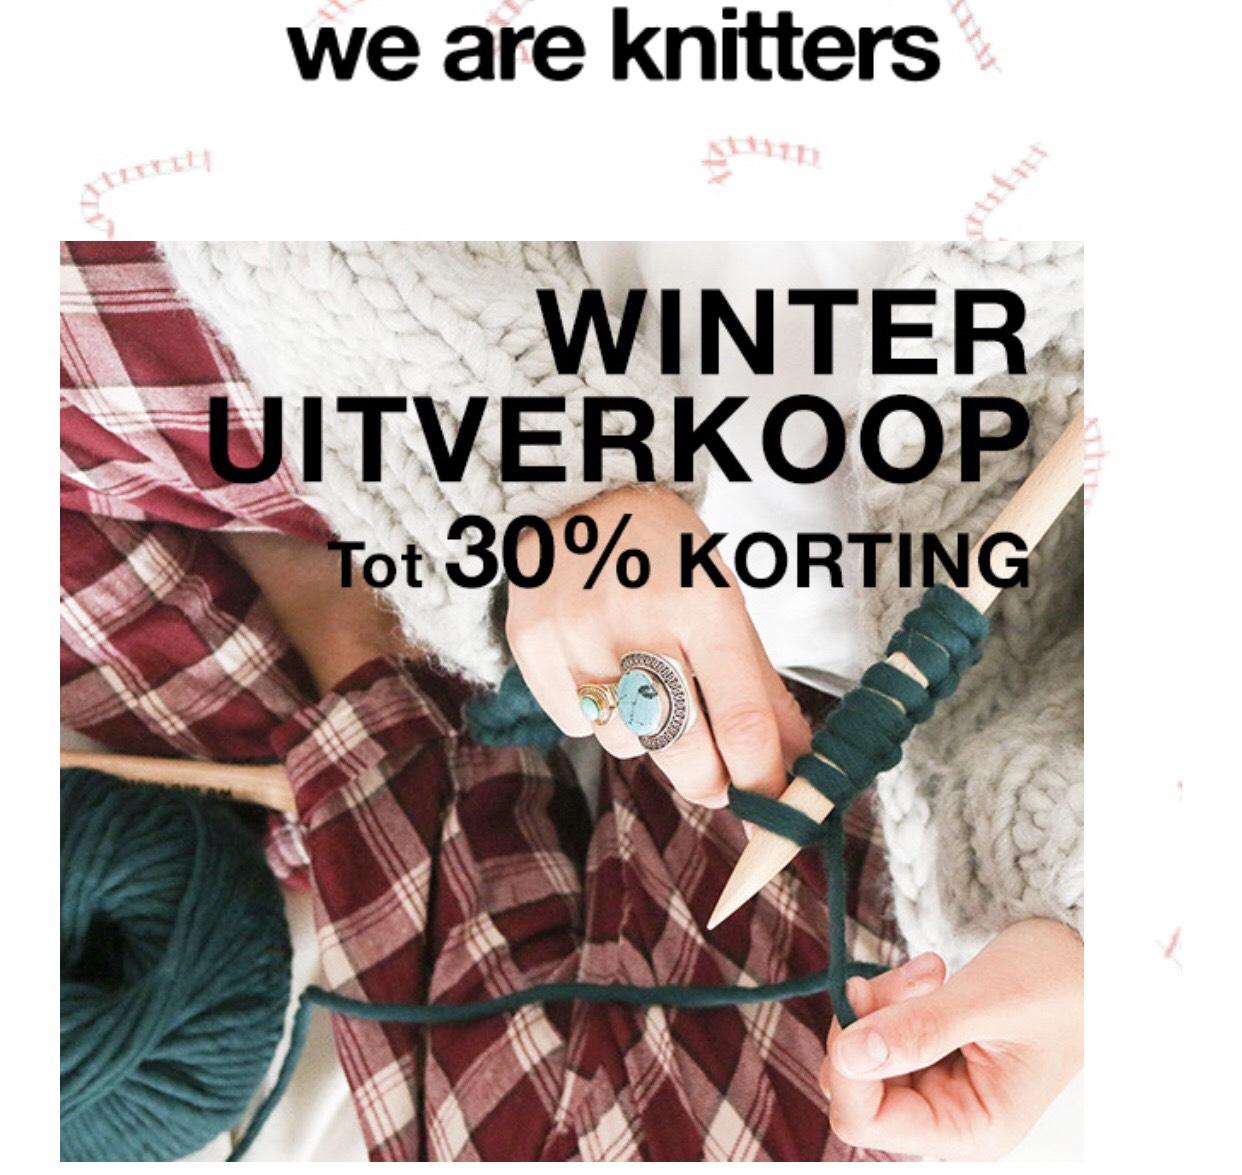 Tot 30% korting bij We Are Knitters op pakketten en losse materialen